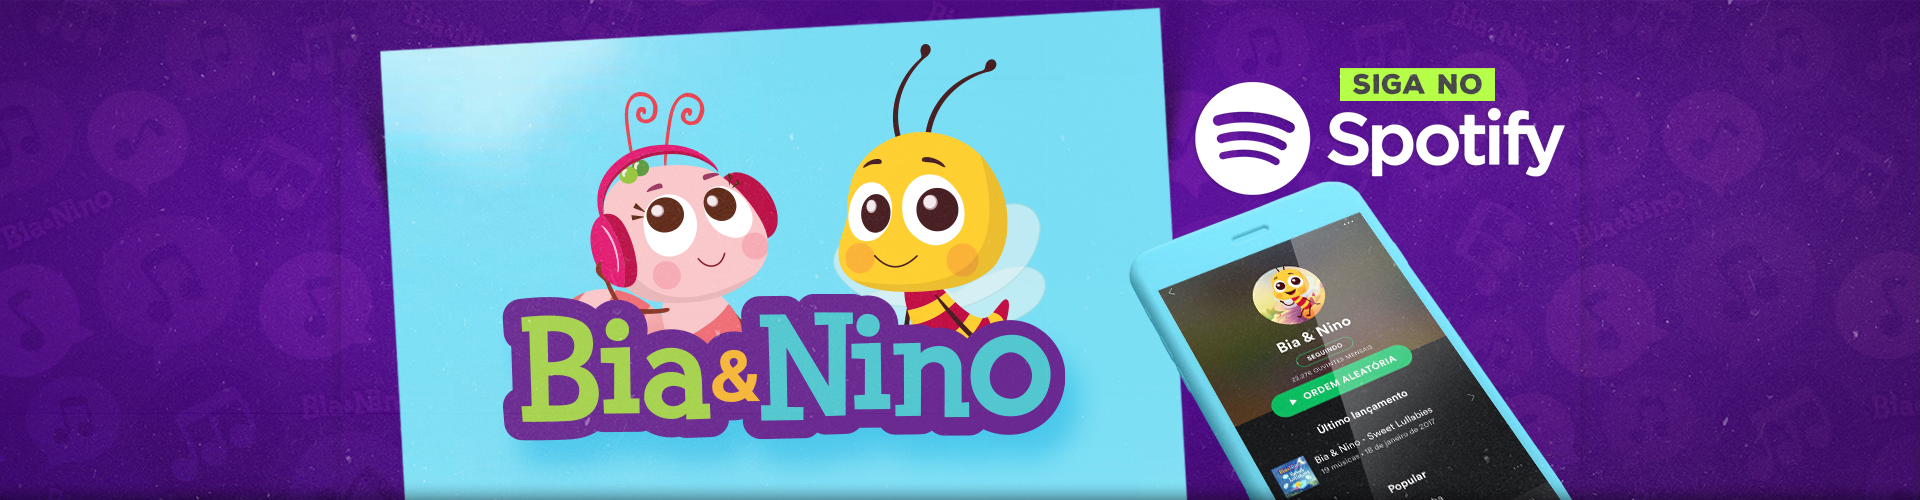 slider-site-bia&nino-spotify